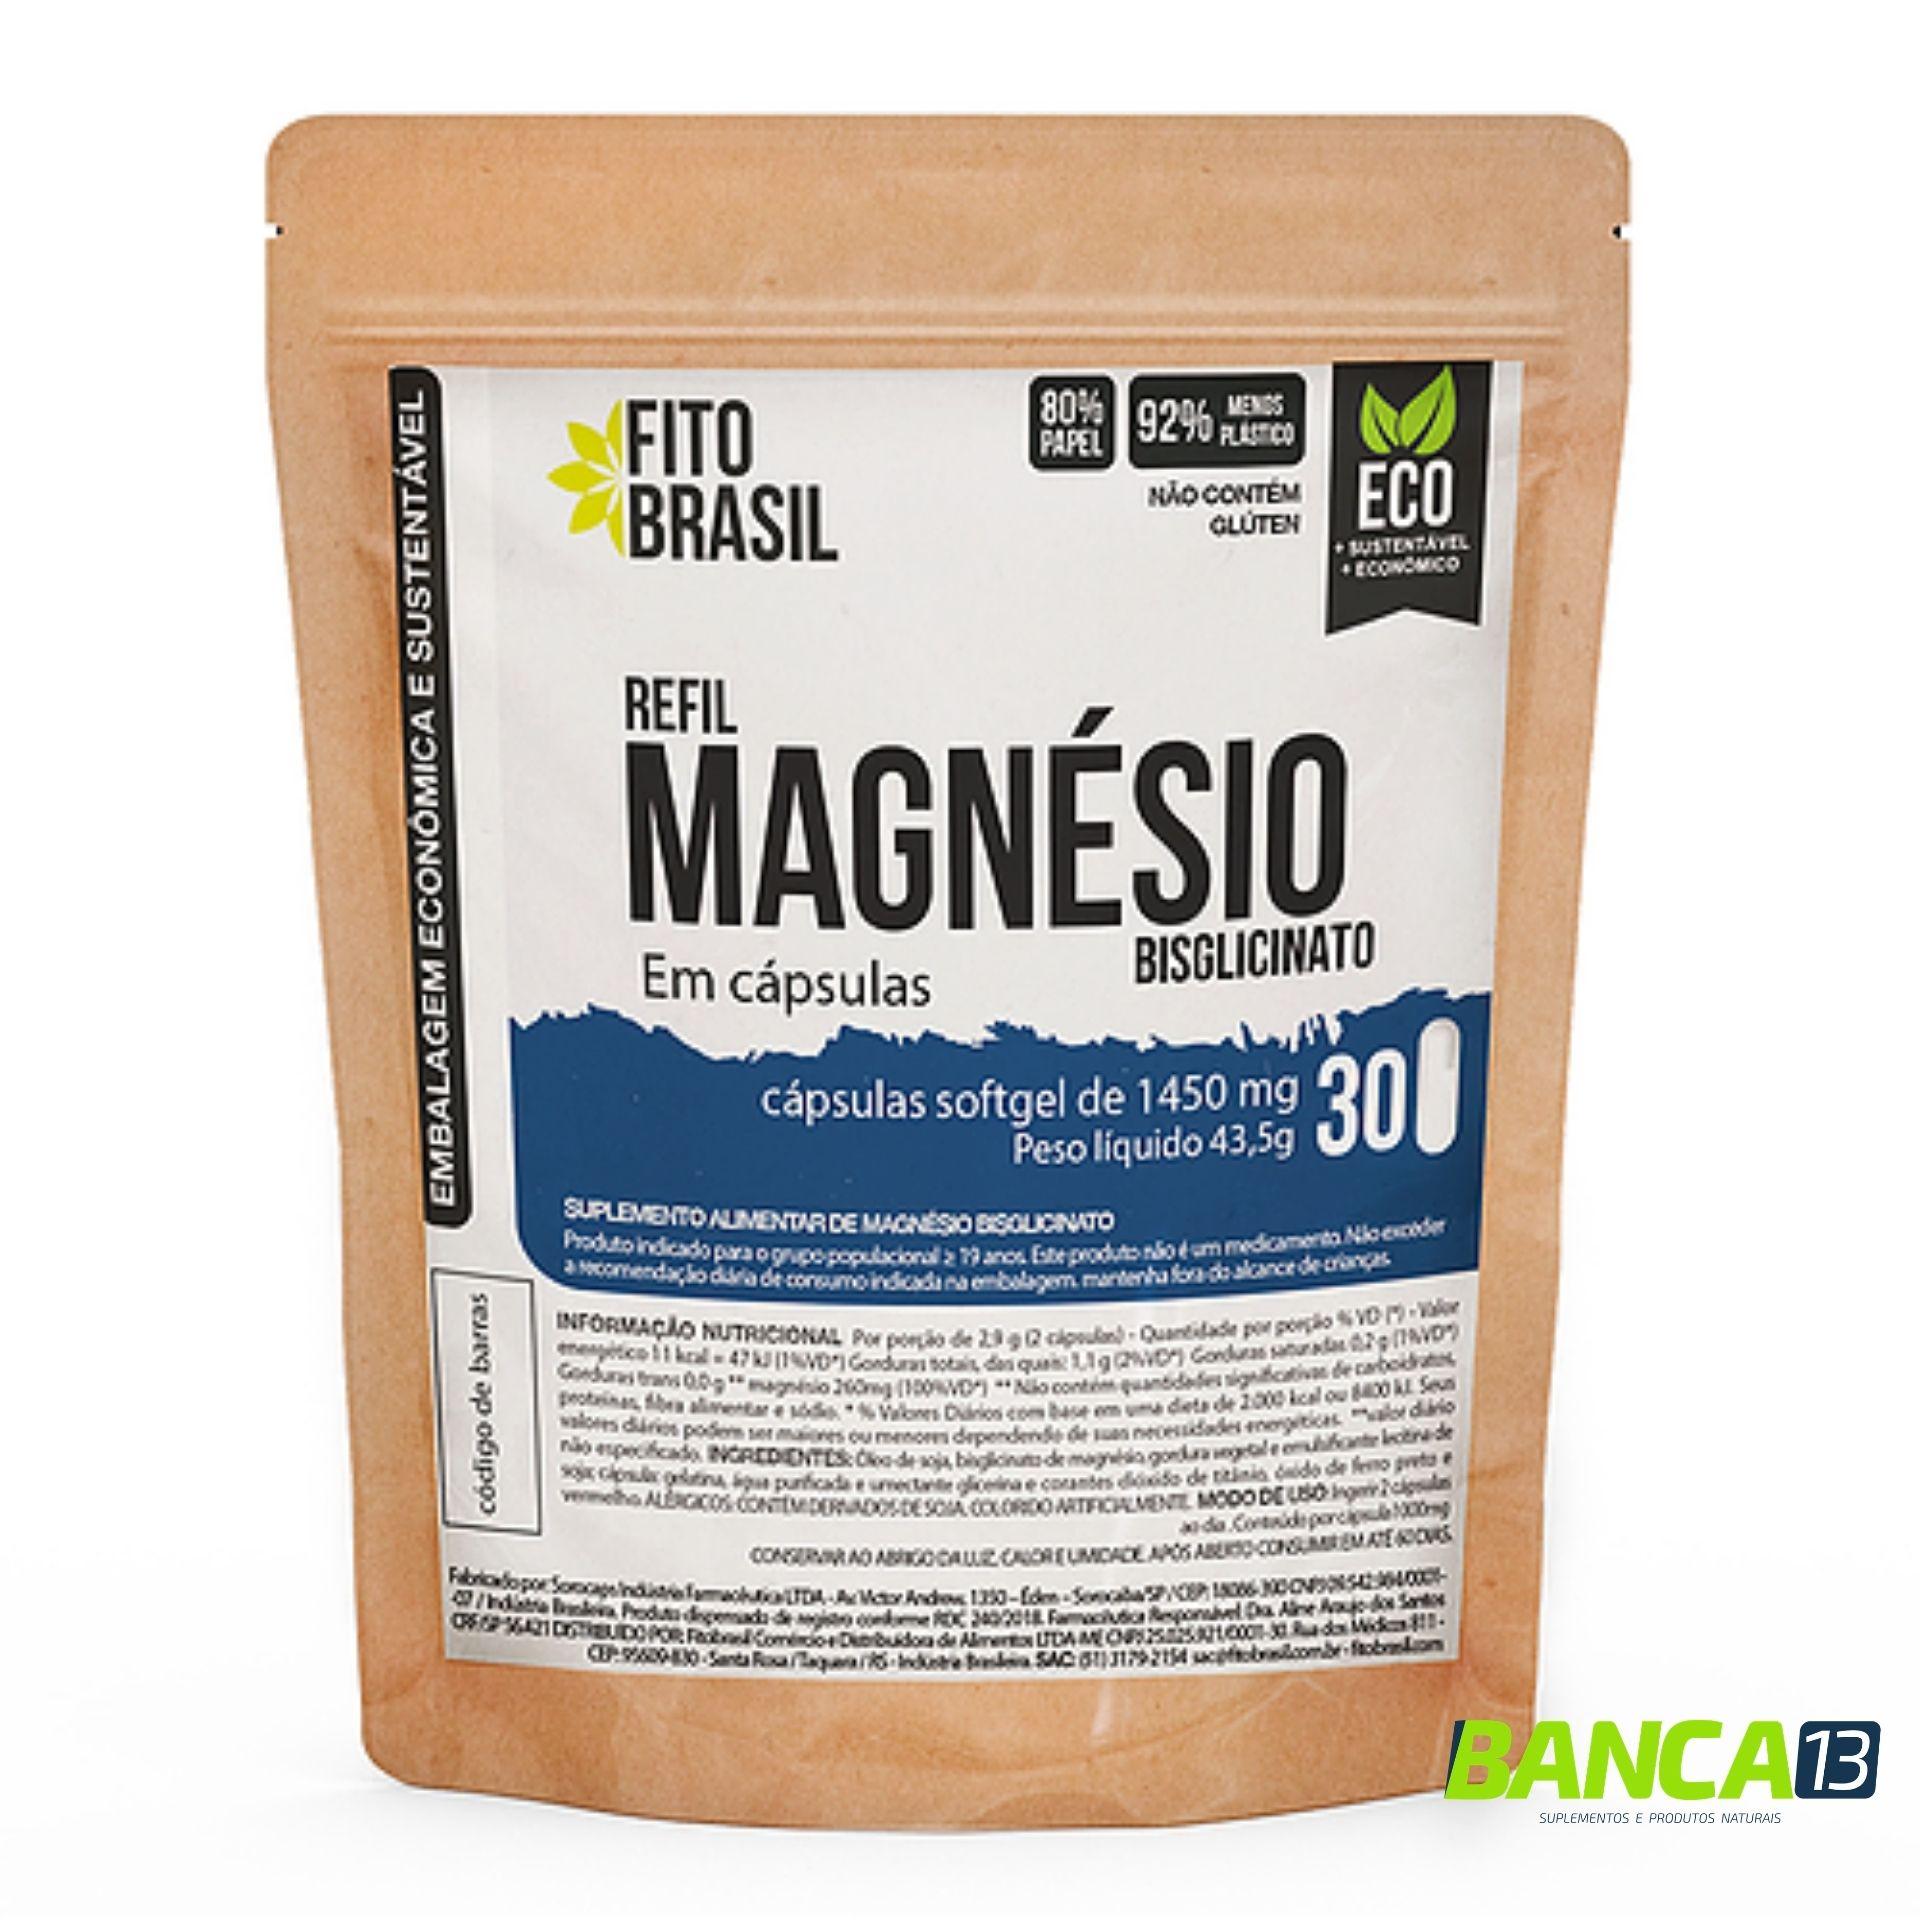 Magnésio em Cápsulas 30 cáps de 1450mg Fitobrasil EcoRefil